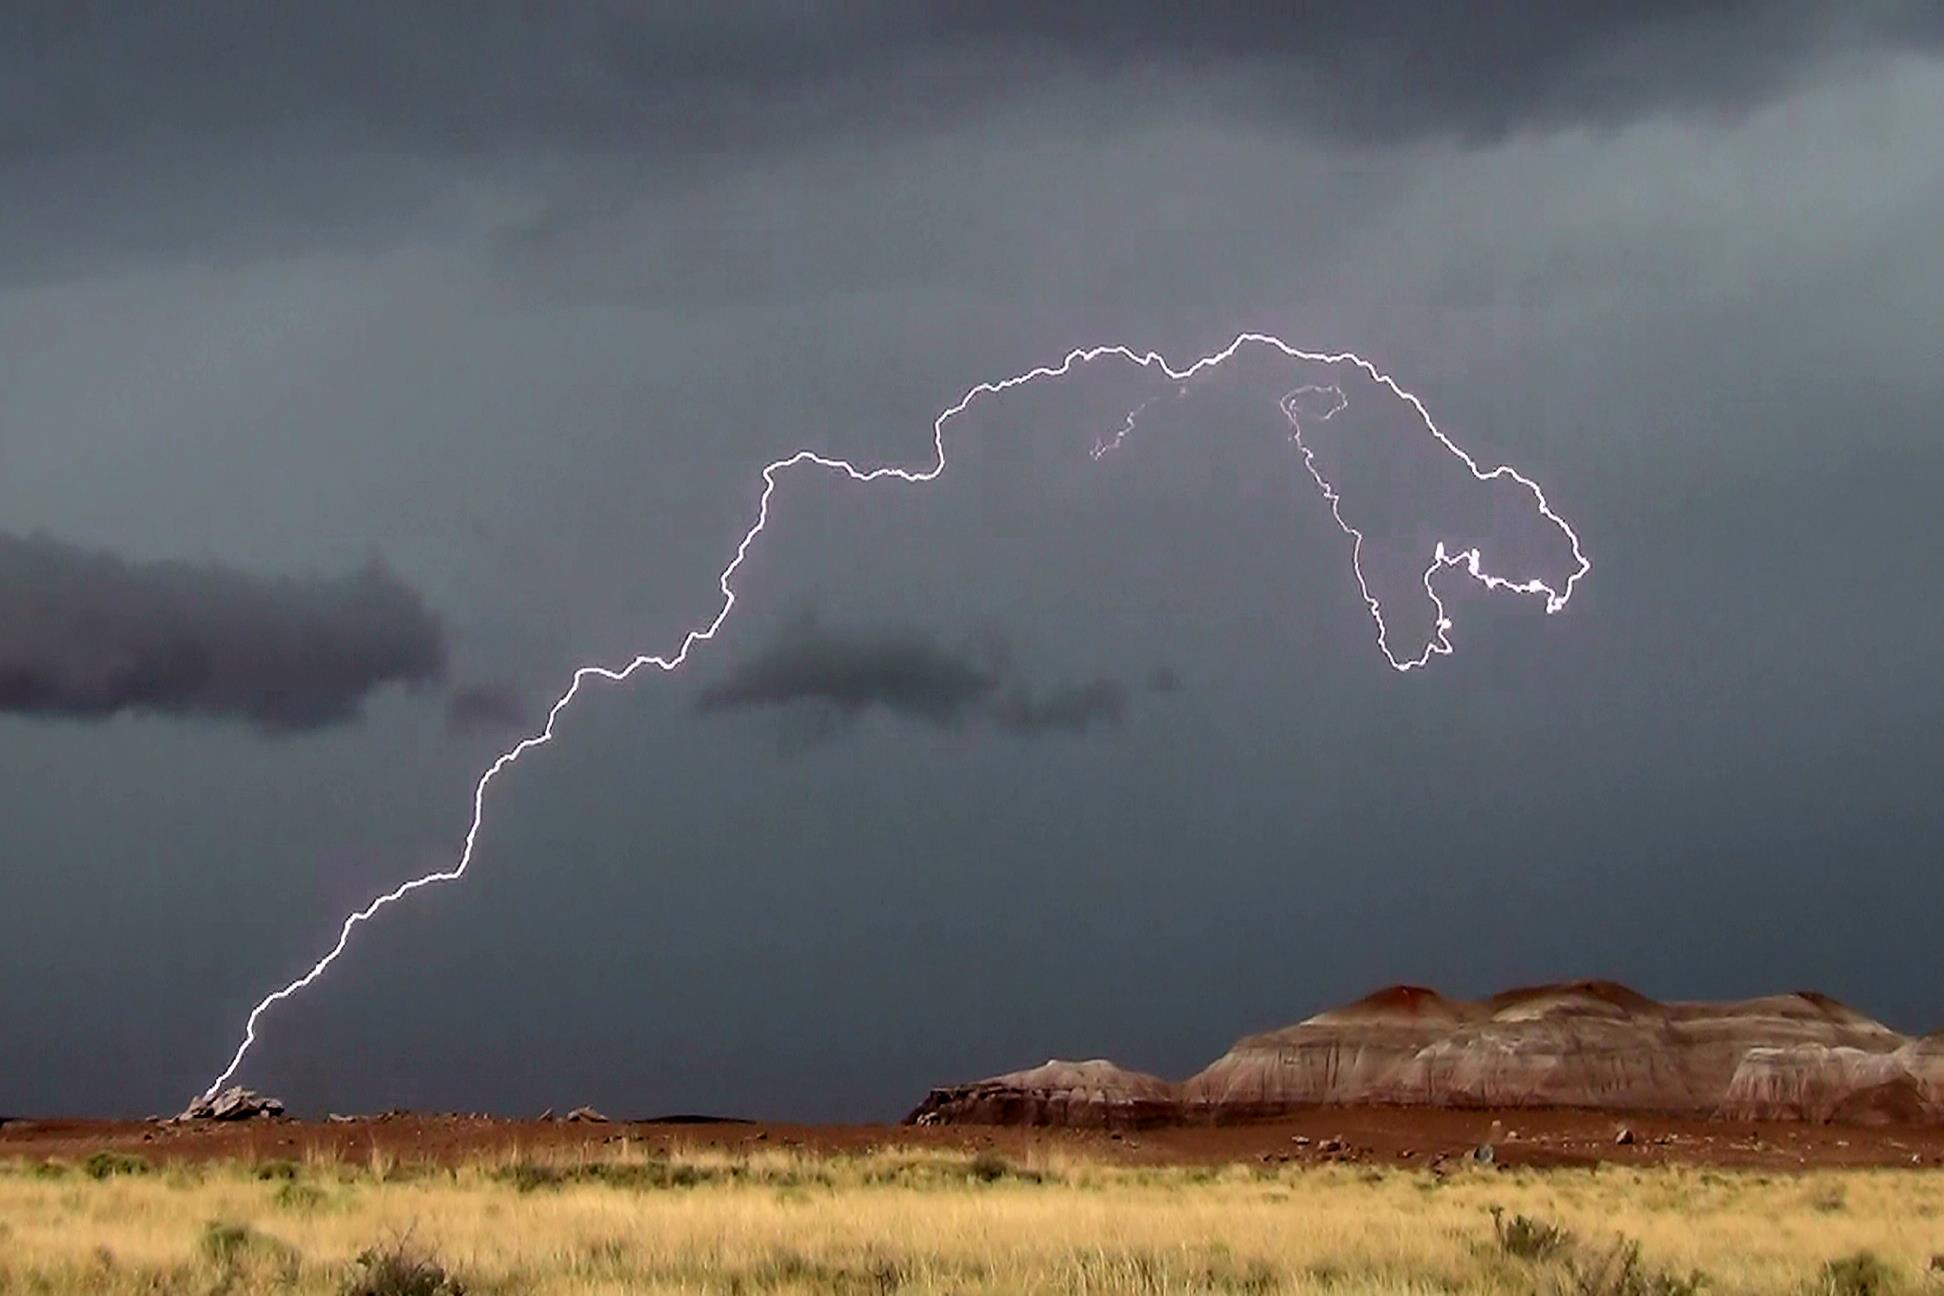 133000 lightnings australia, anomalous weather australia, australia lightning storm